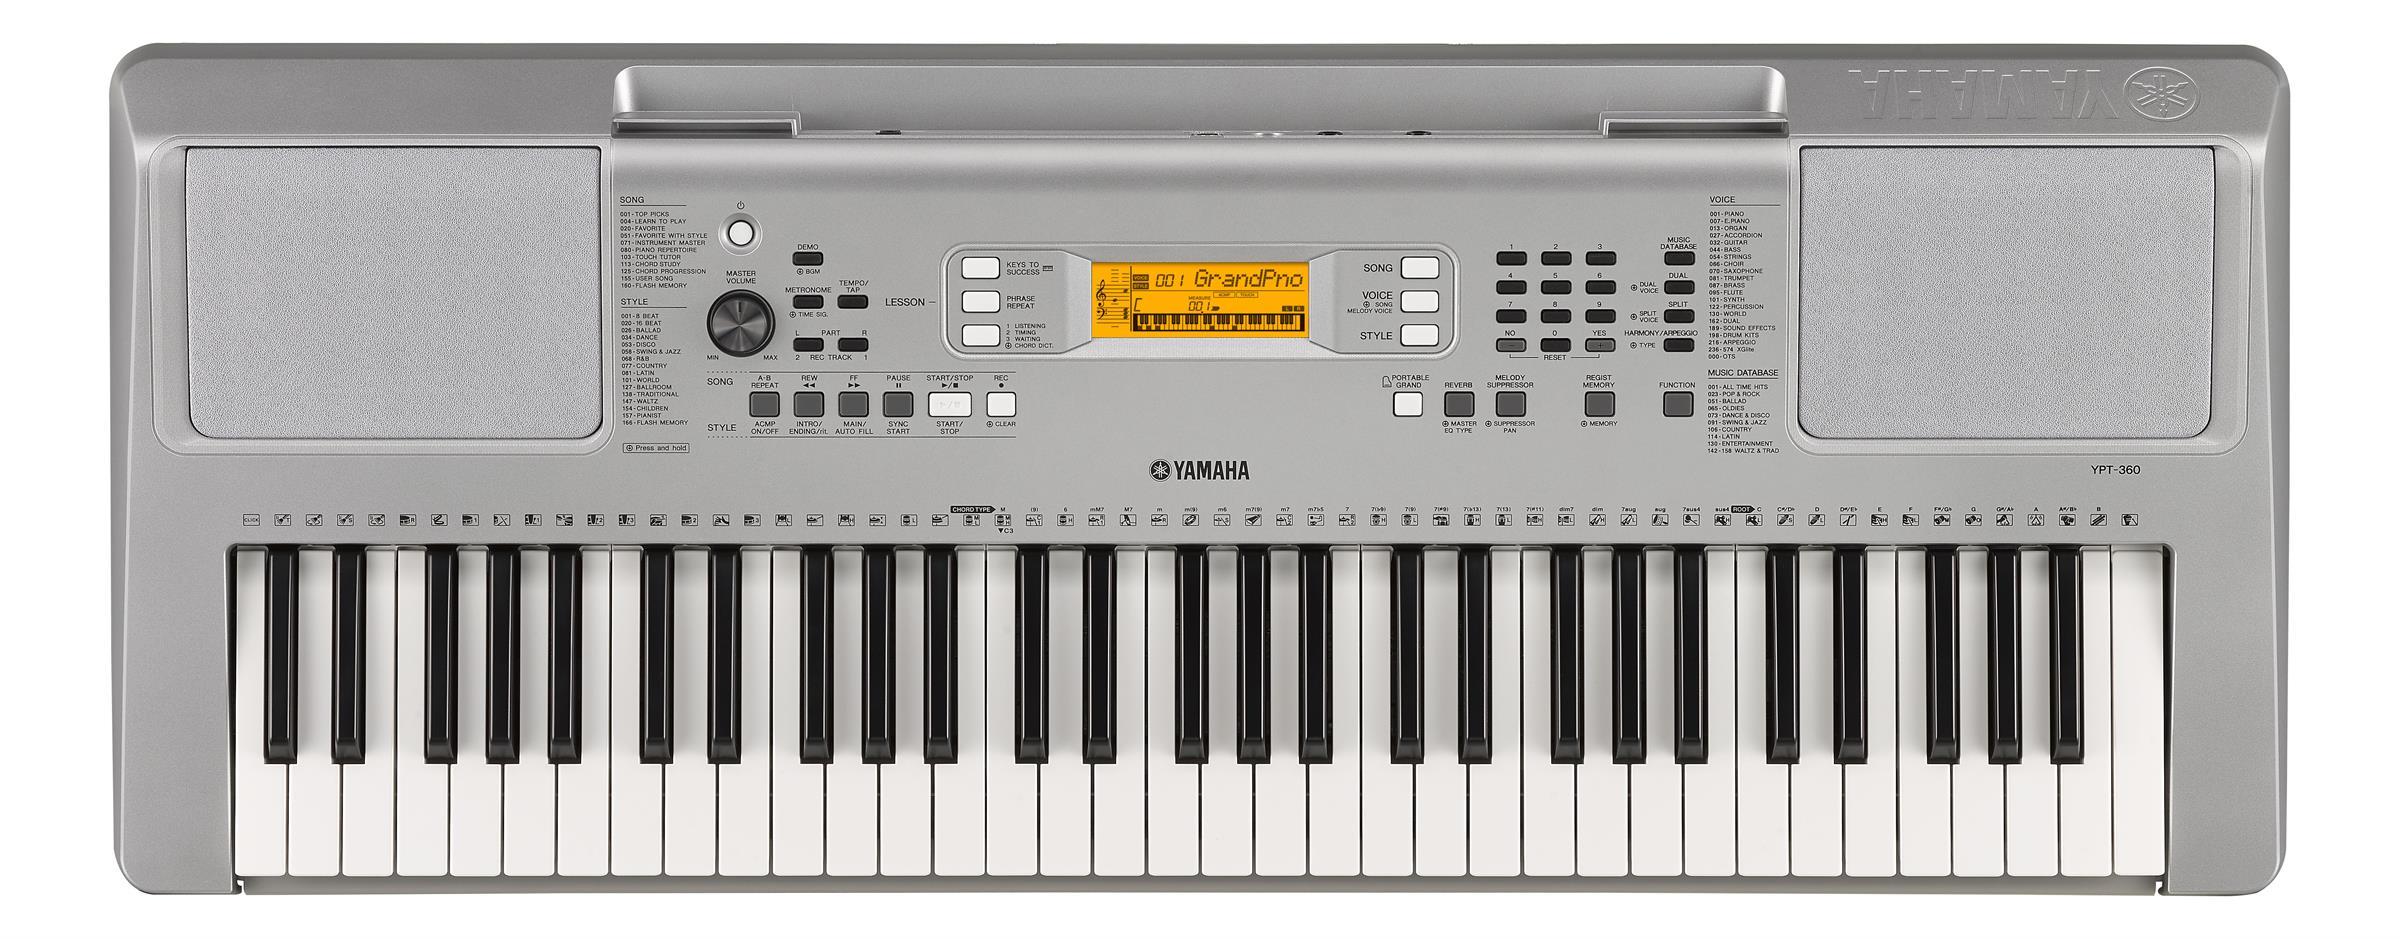 Klaviatura, harmonika in orglica YPT-360 KLAVIATURA YAMAHA